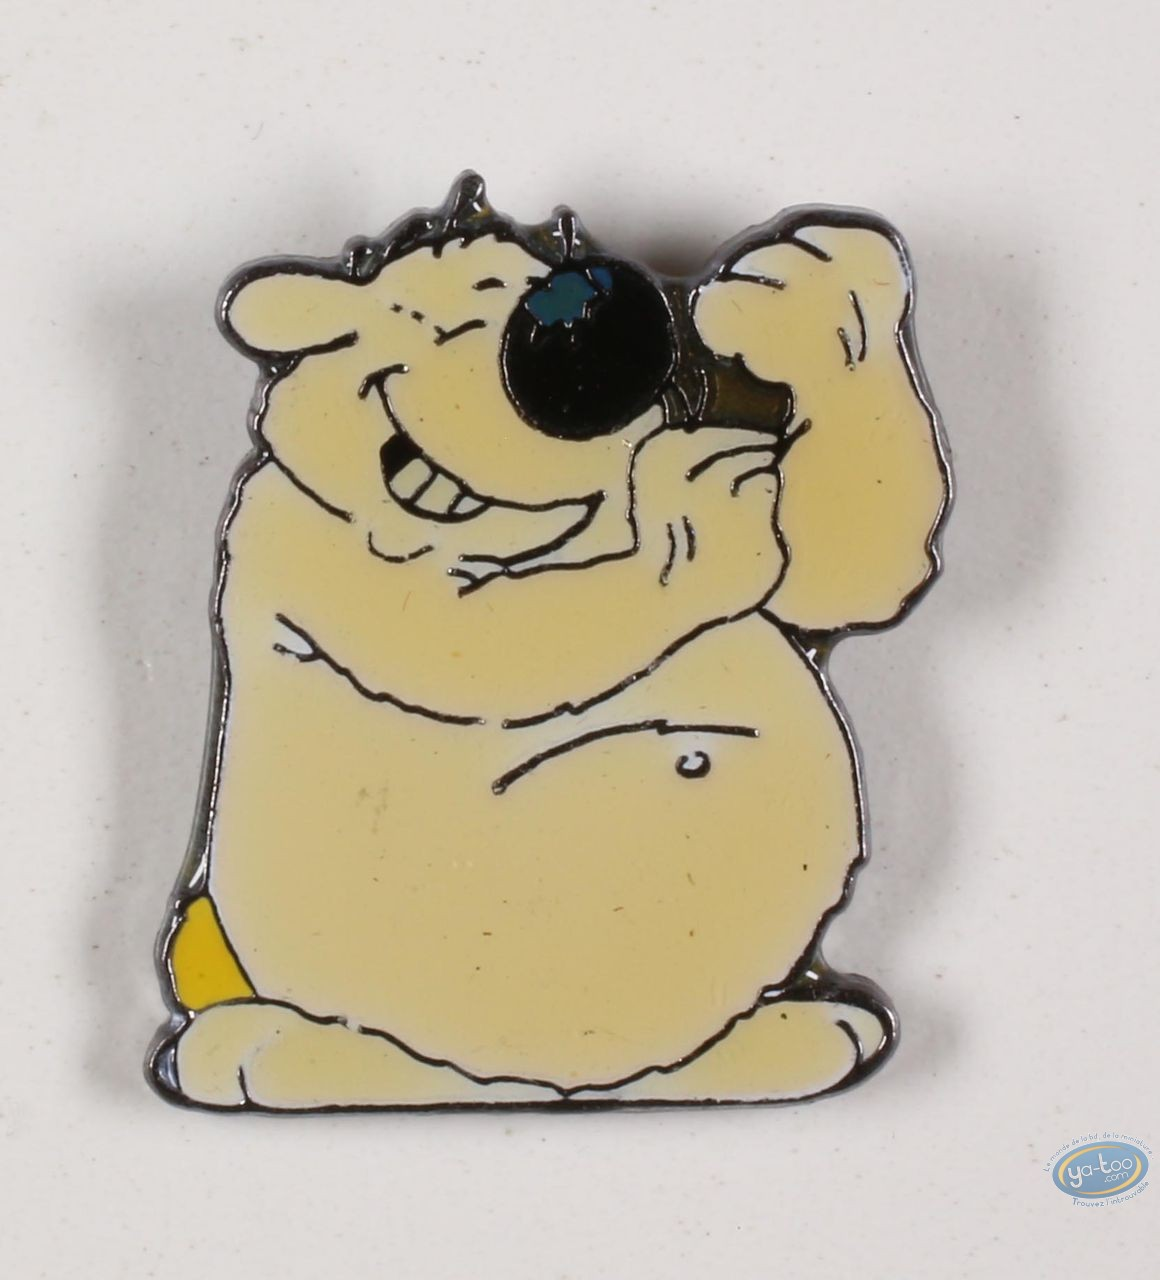 Pin's, Cubitus : Cubitus fmakes someone the finger